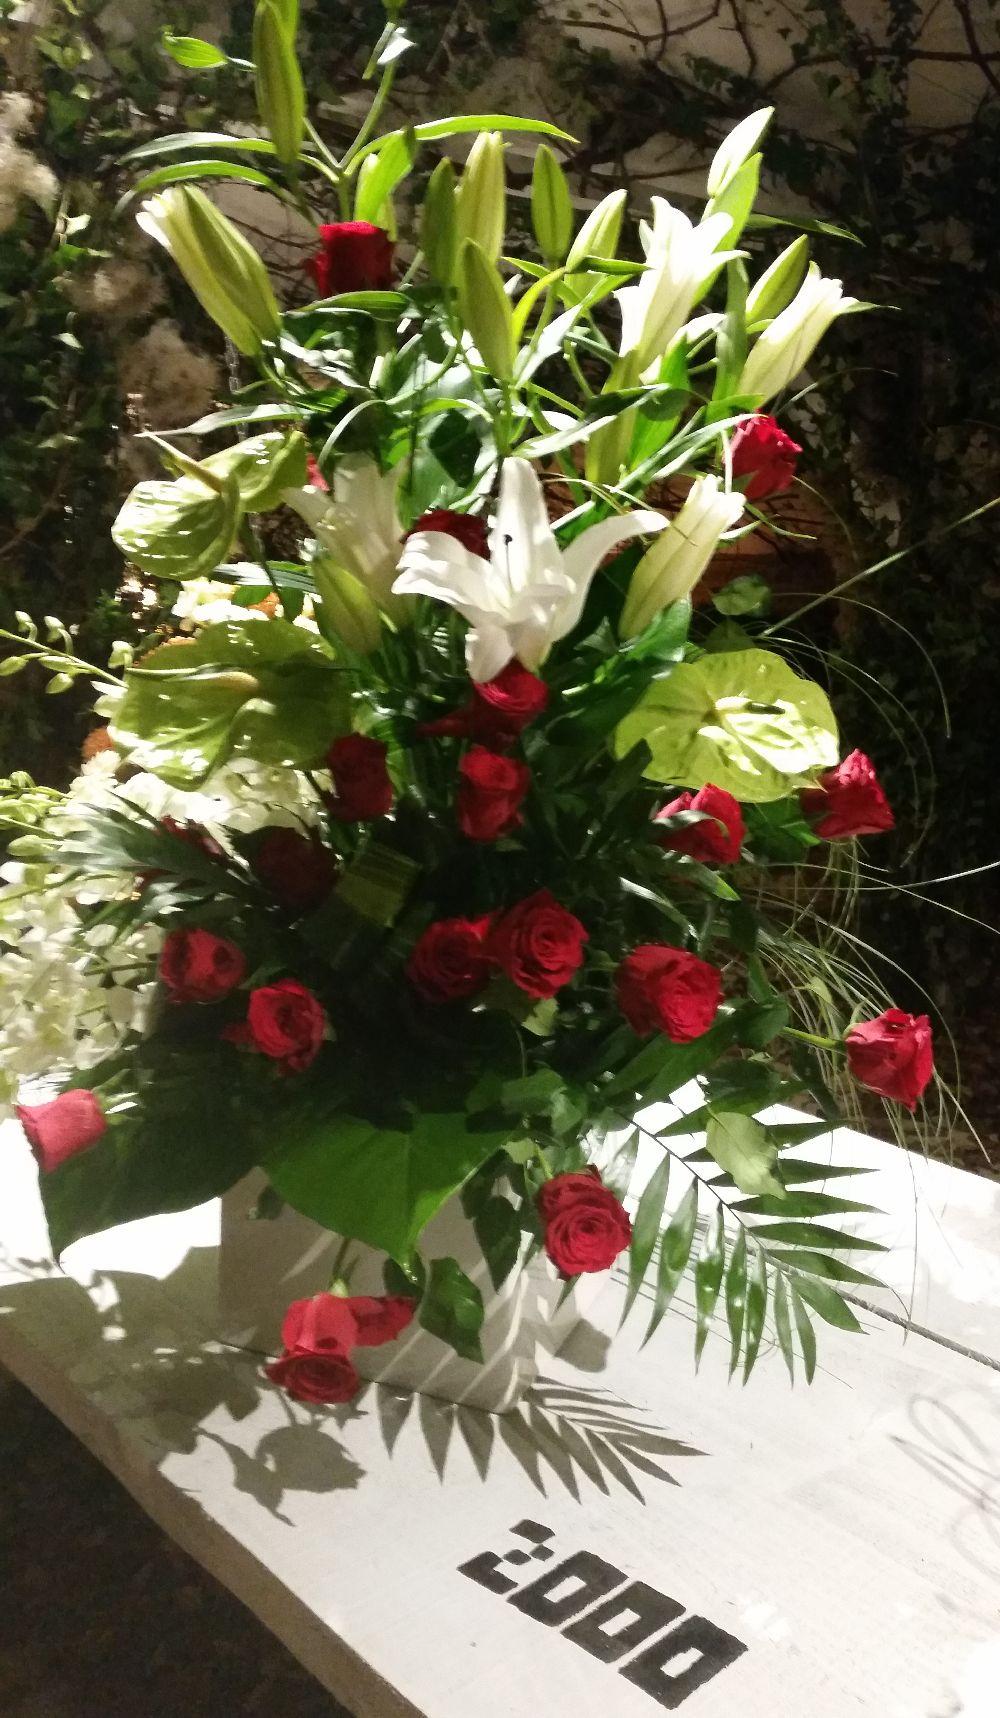 adelaparvu.com despre 45 de ani aniversare Floraria Iris, design floral Nicu Bocancea (7)